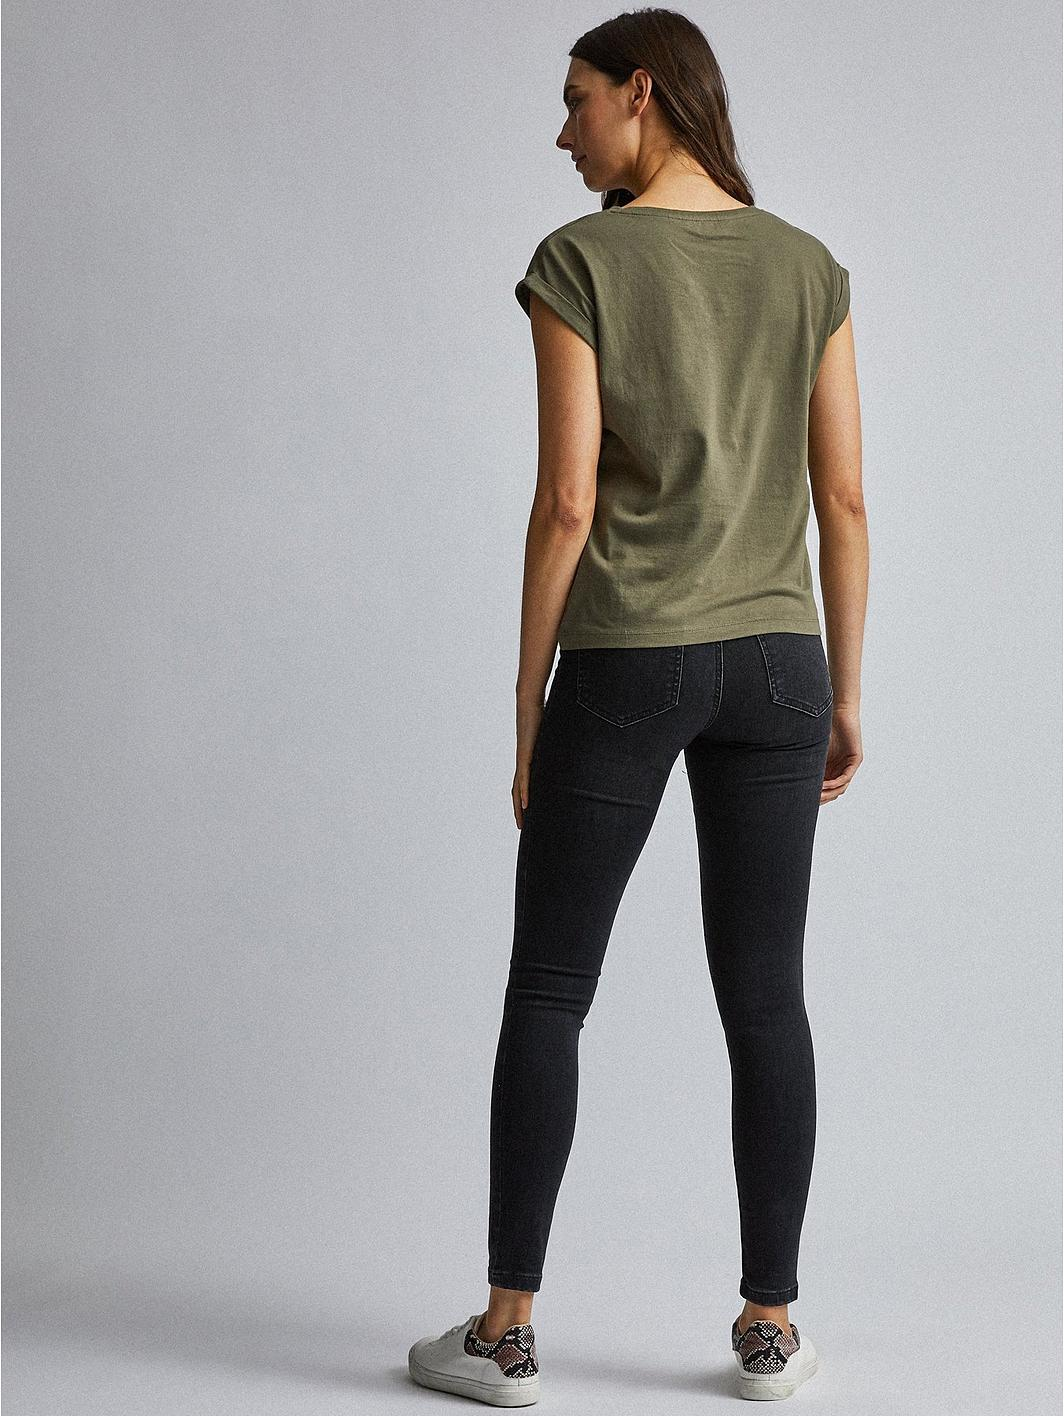 Dorothy Perkins Alex Mid Rise Skinny Jeans - Black KtzYDa